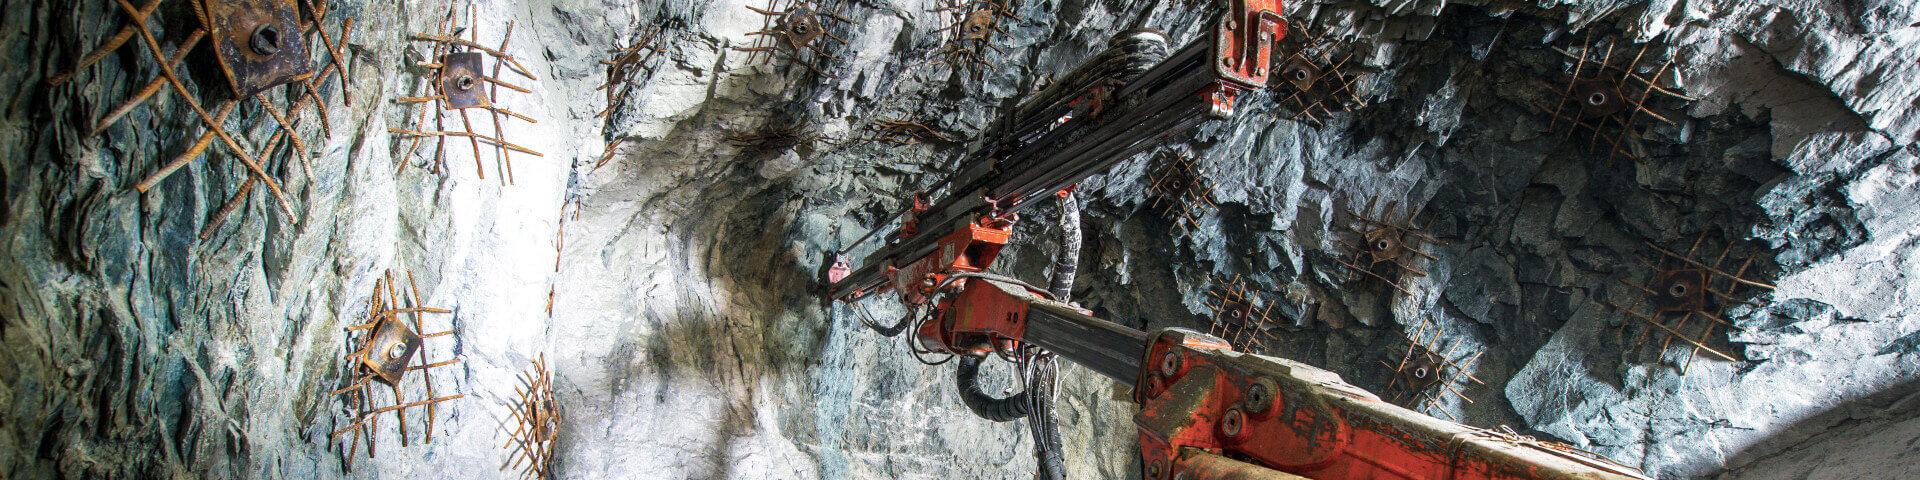 drilling blast tunnels herobanner 1920x480